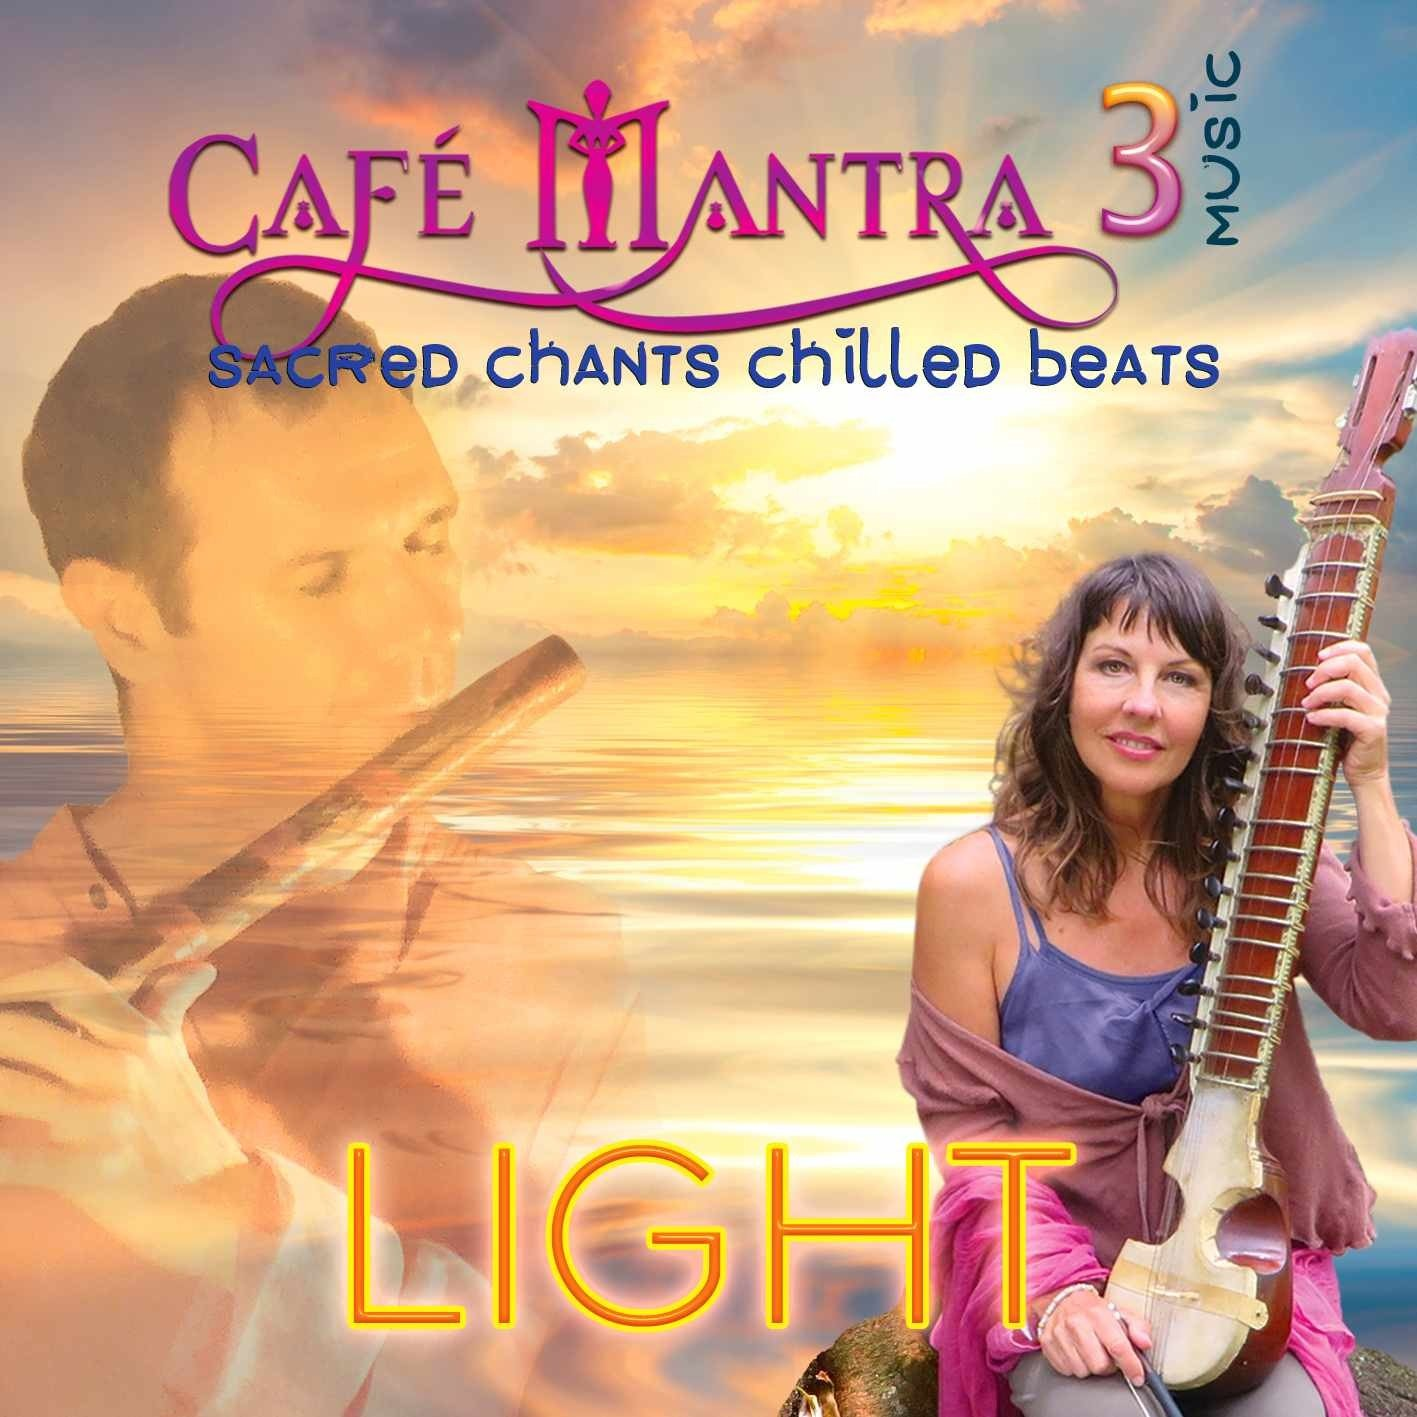 DOWNLOAD: Cafe Mantra Music3 LIGHT